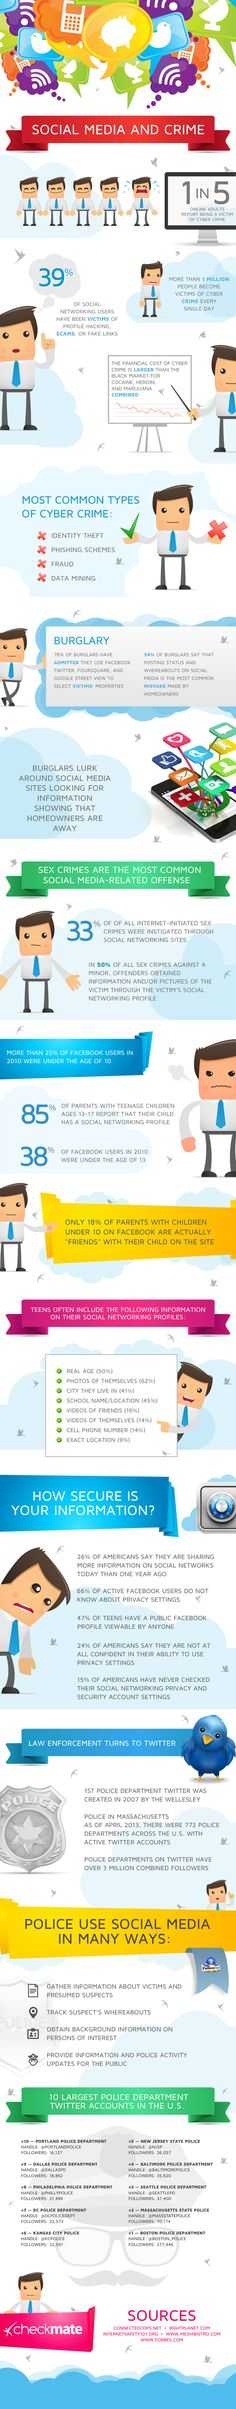 Are You Safe on #SocialMedia? [INFOGRAPHIC] #SuperiorVirtual